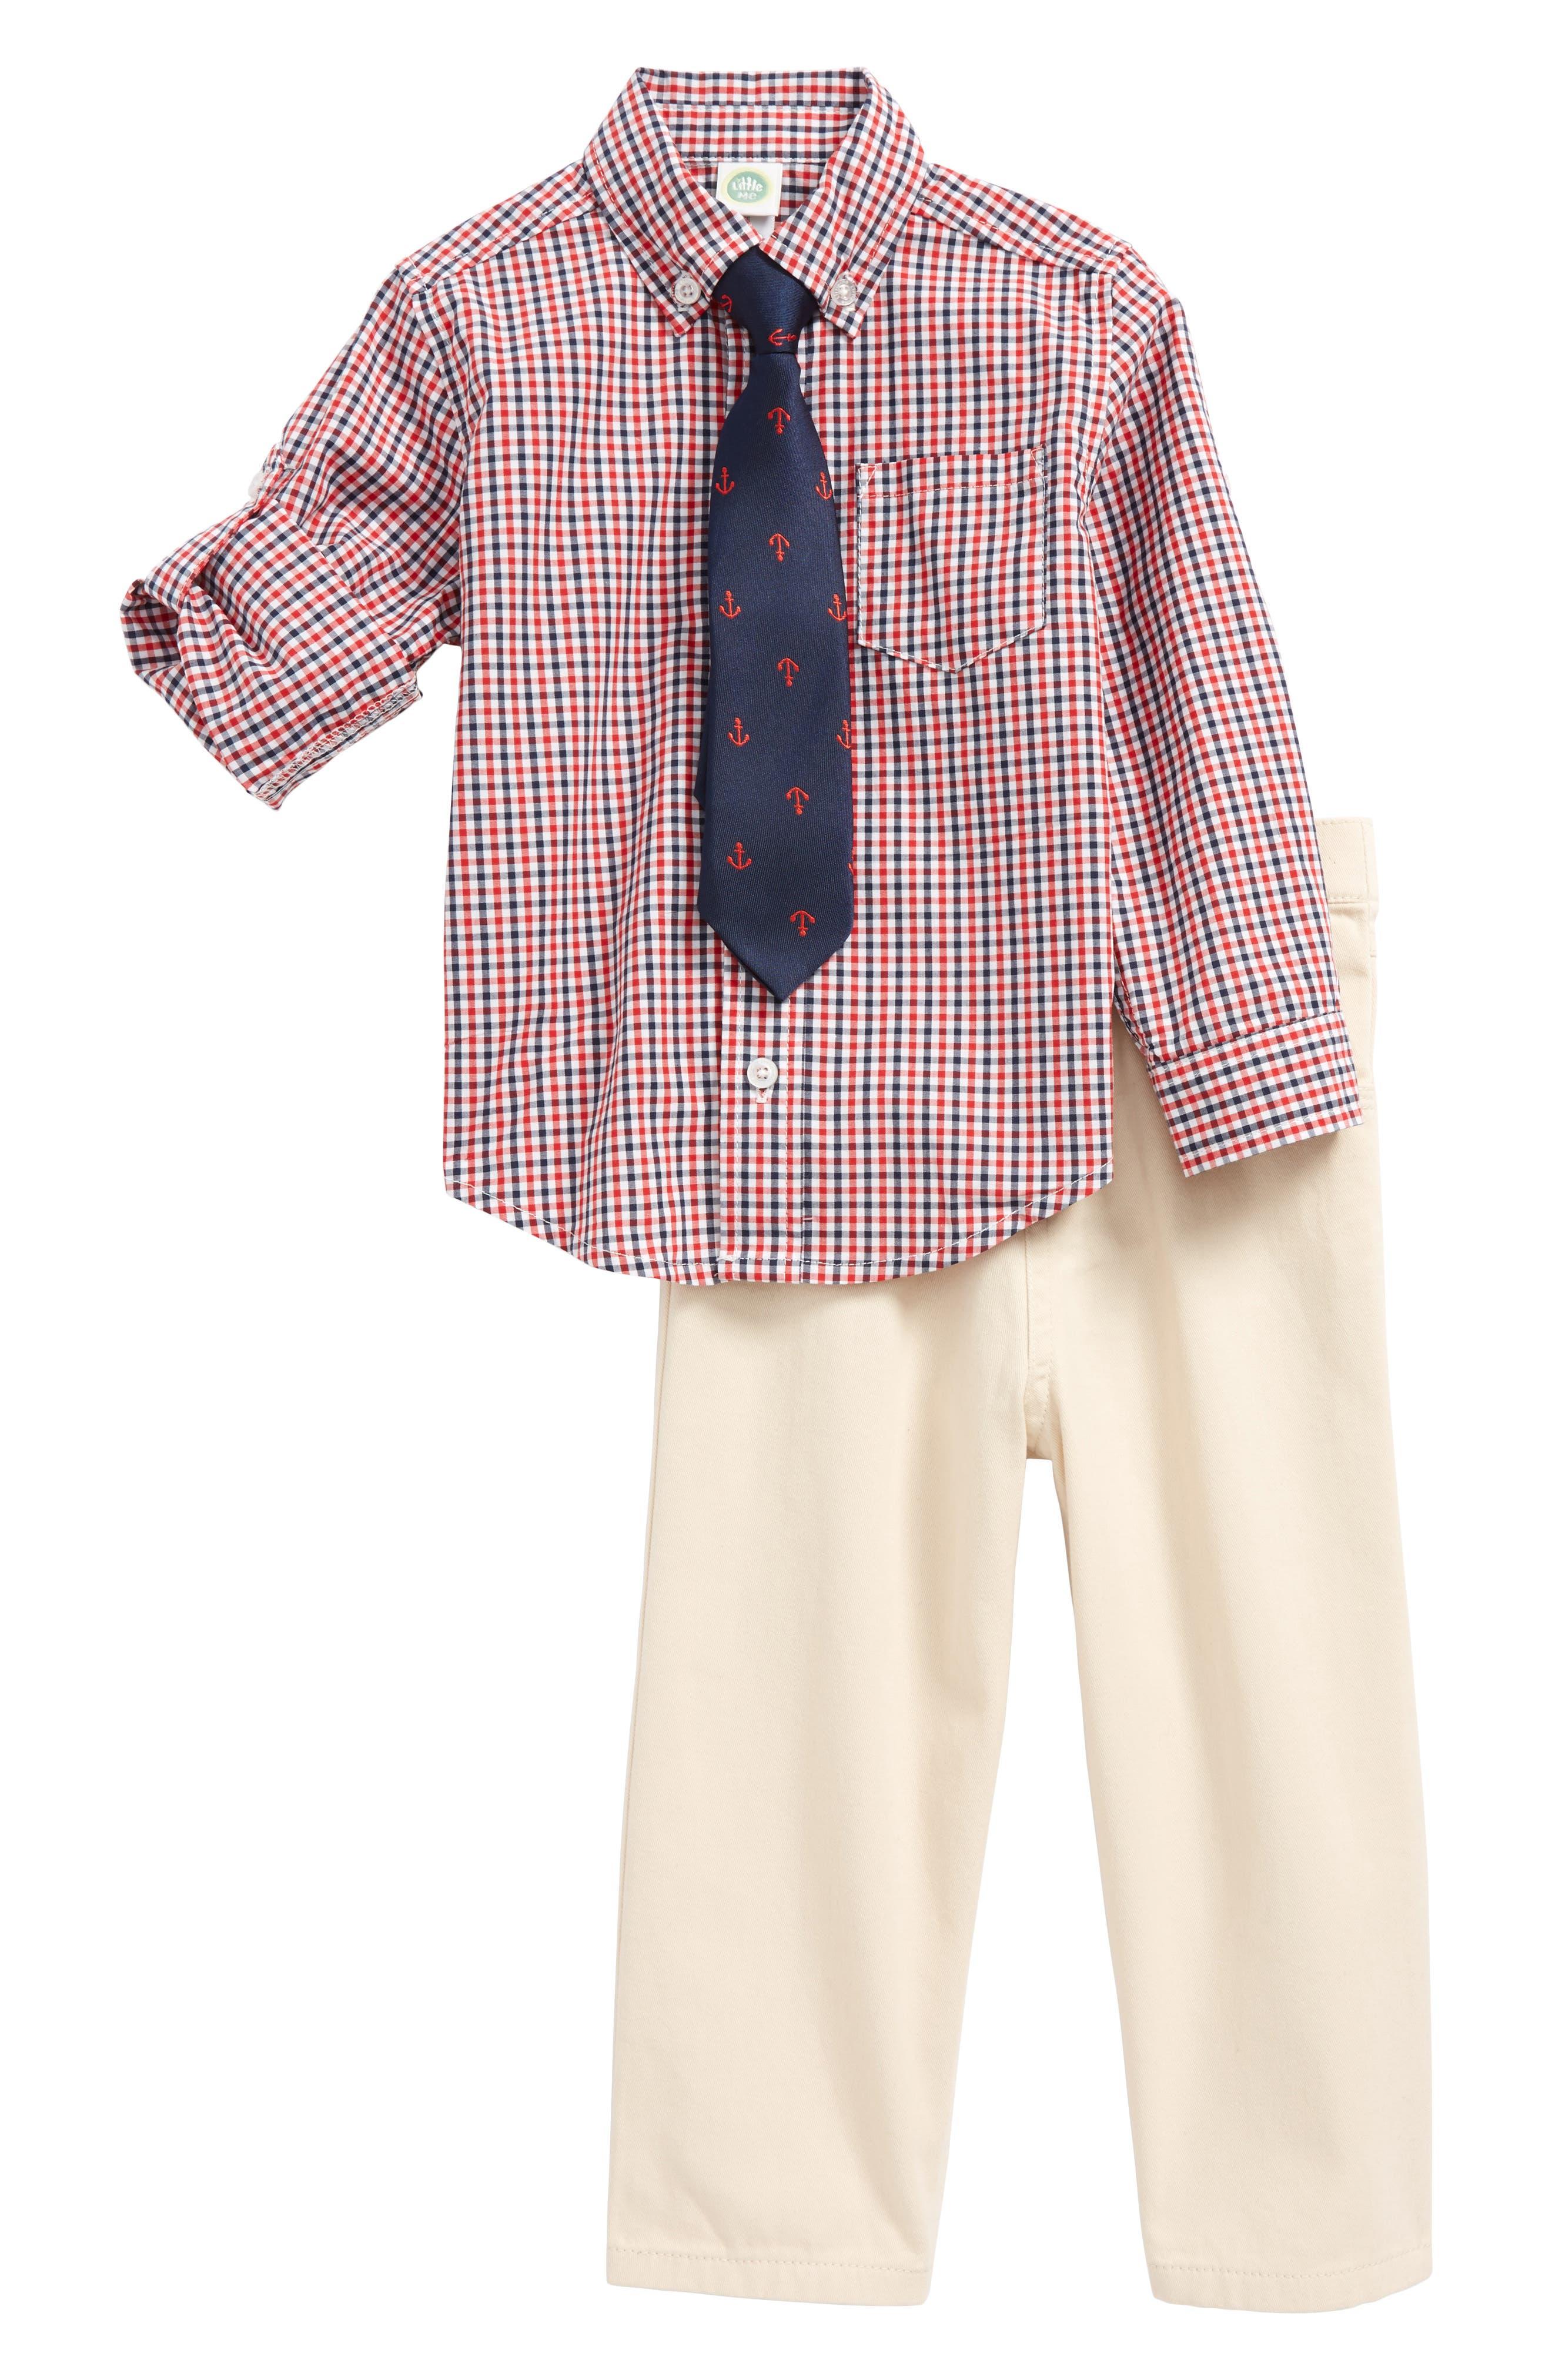 Main Image - Little Me Check Shirt, Pants & Tie Set (Baby Boys)